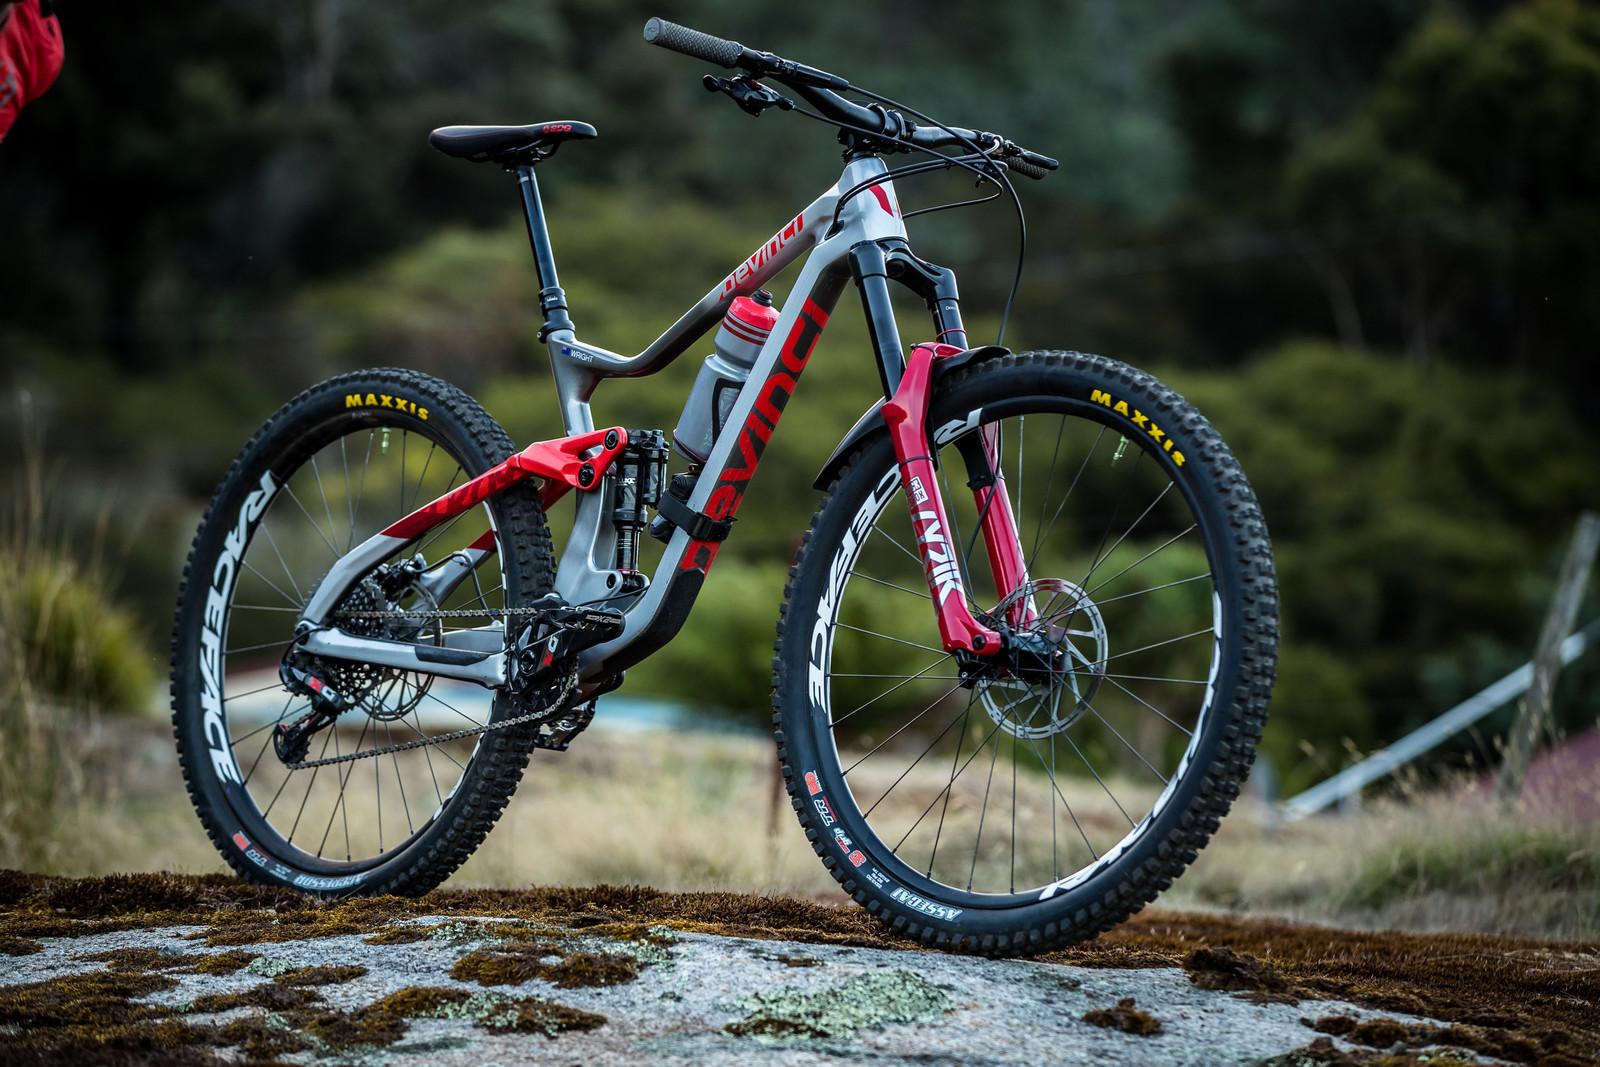 What's Stock, What's Not - Keegan Wright's Devinci Troy for Tasmania - What's Stock, What's Not - Tasmania Enduro World Series - Mountain Biking Pictures - Vital MTB